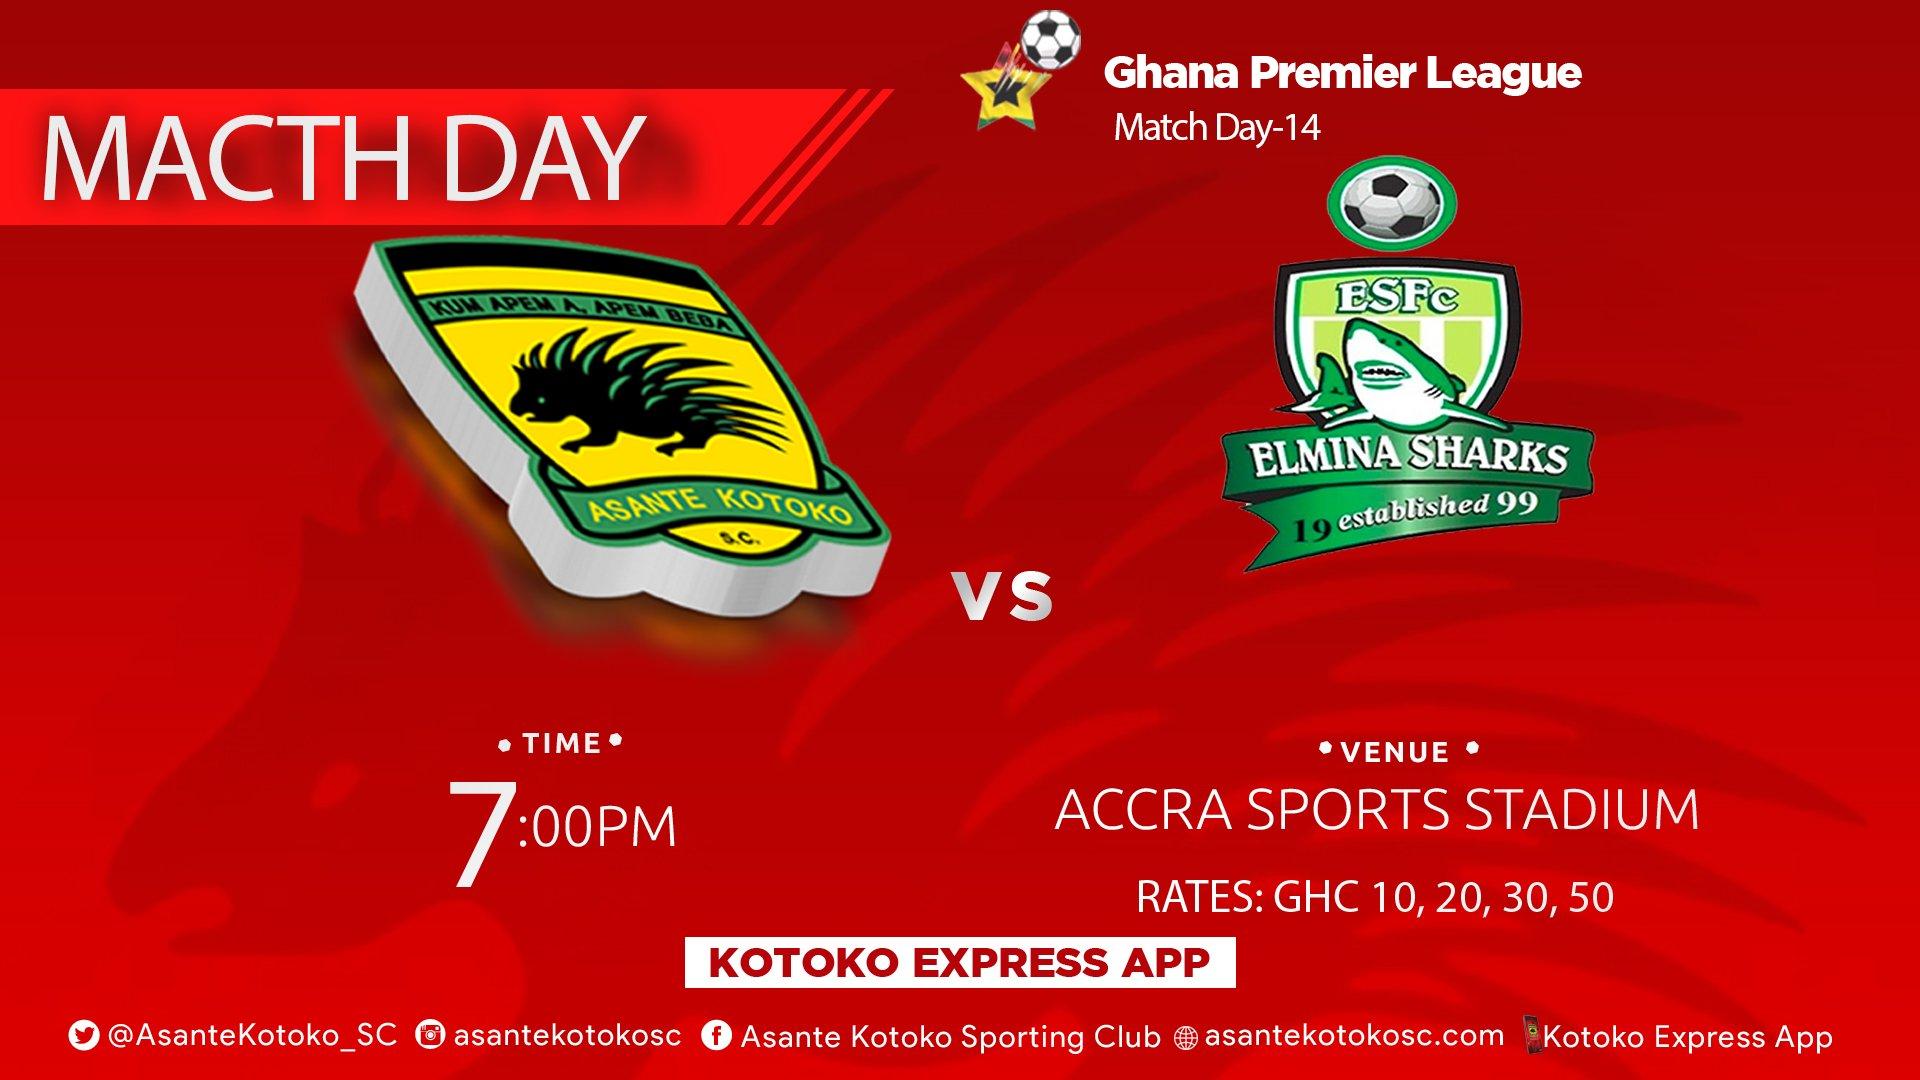 Asante Kotoko vs Elmina Sharks - Confirmed starting lineups